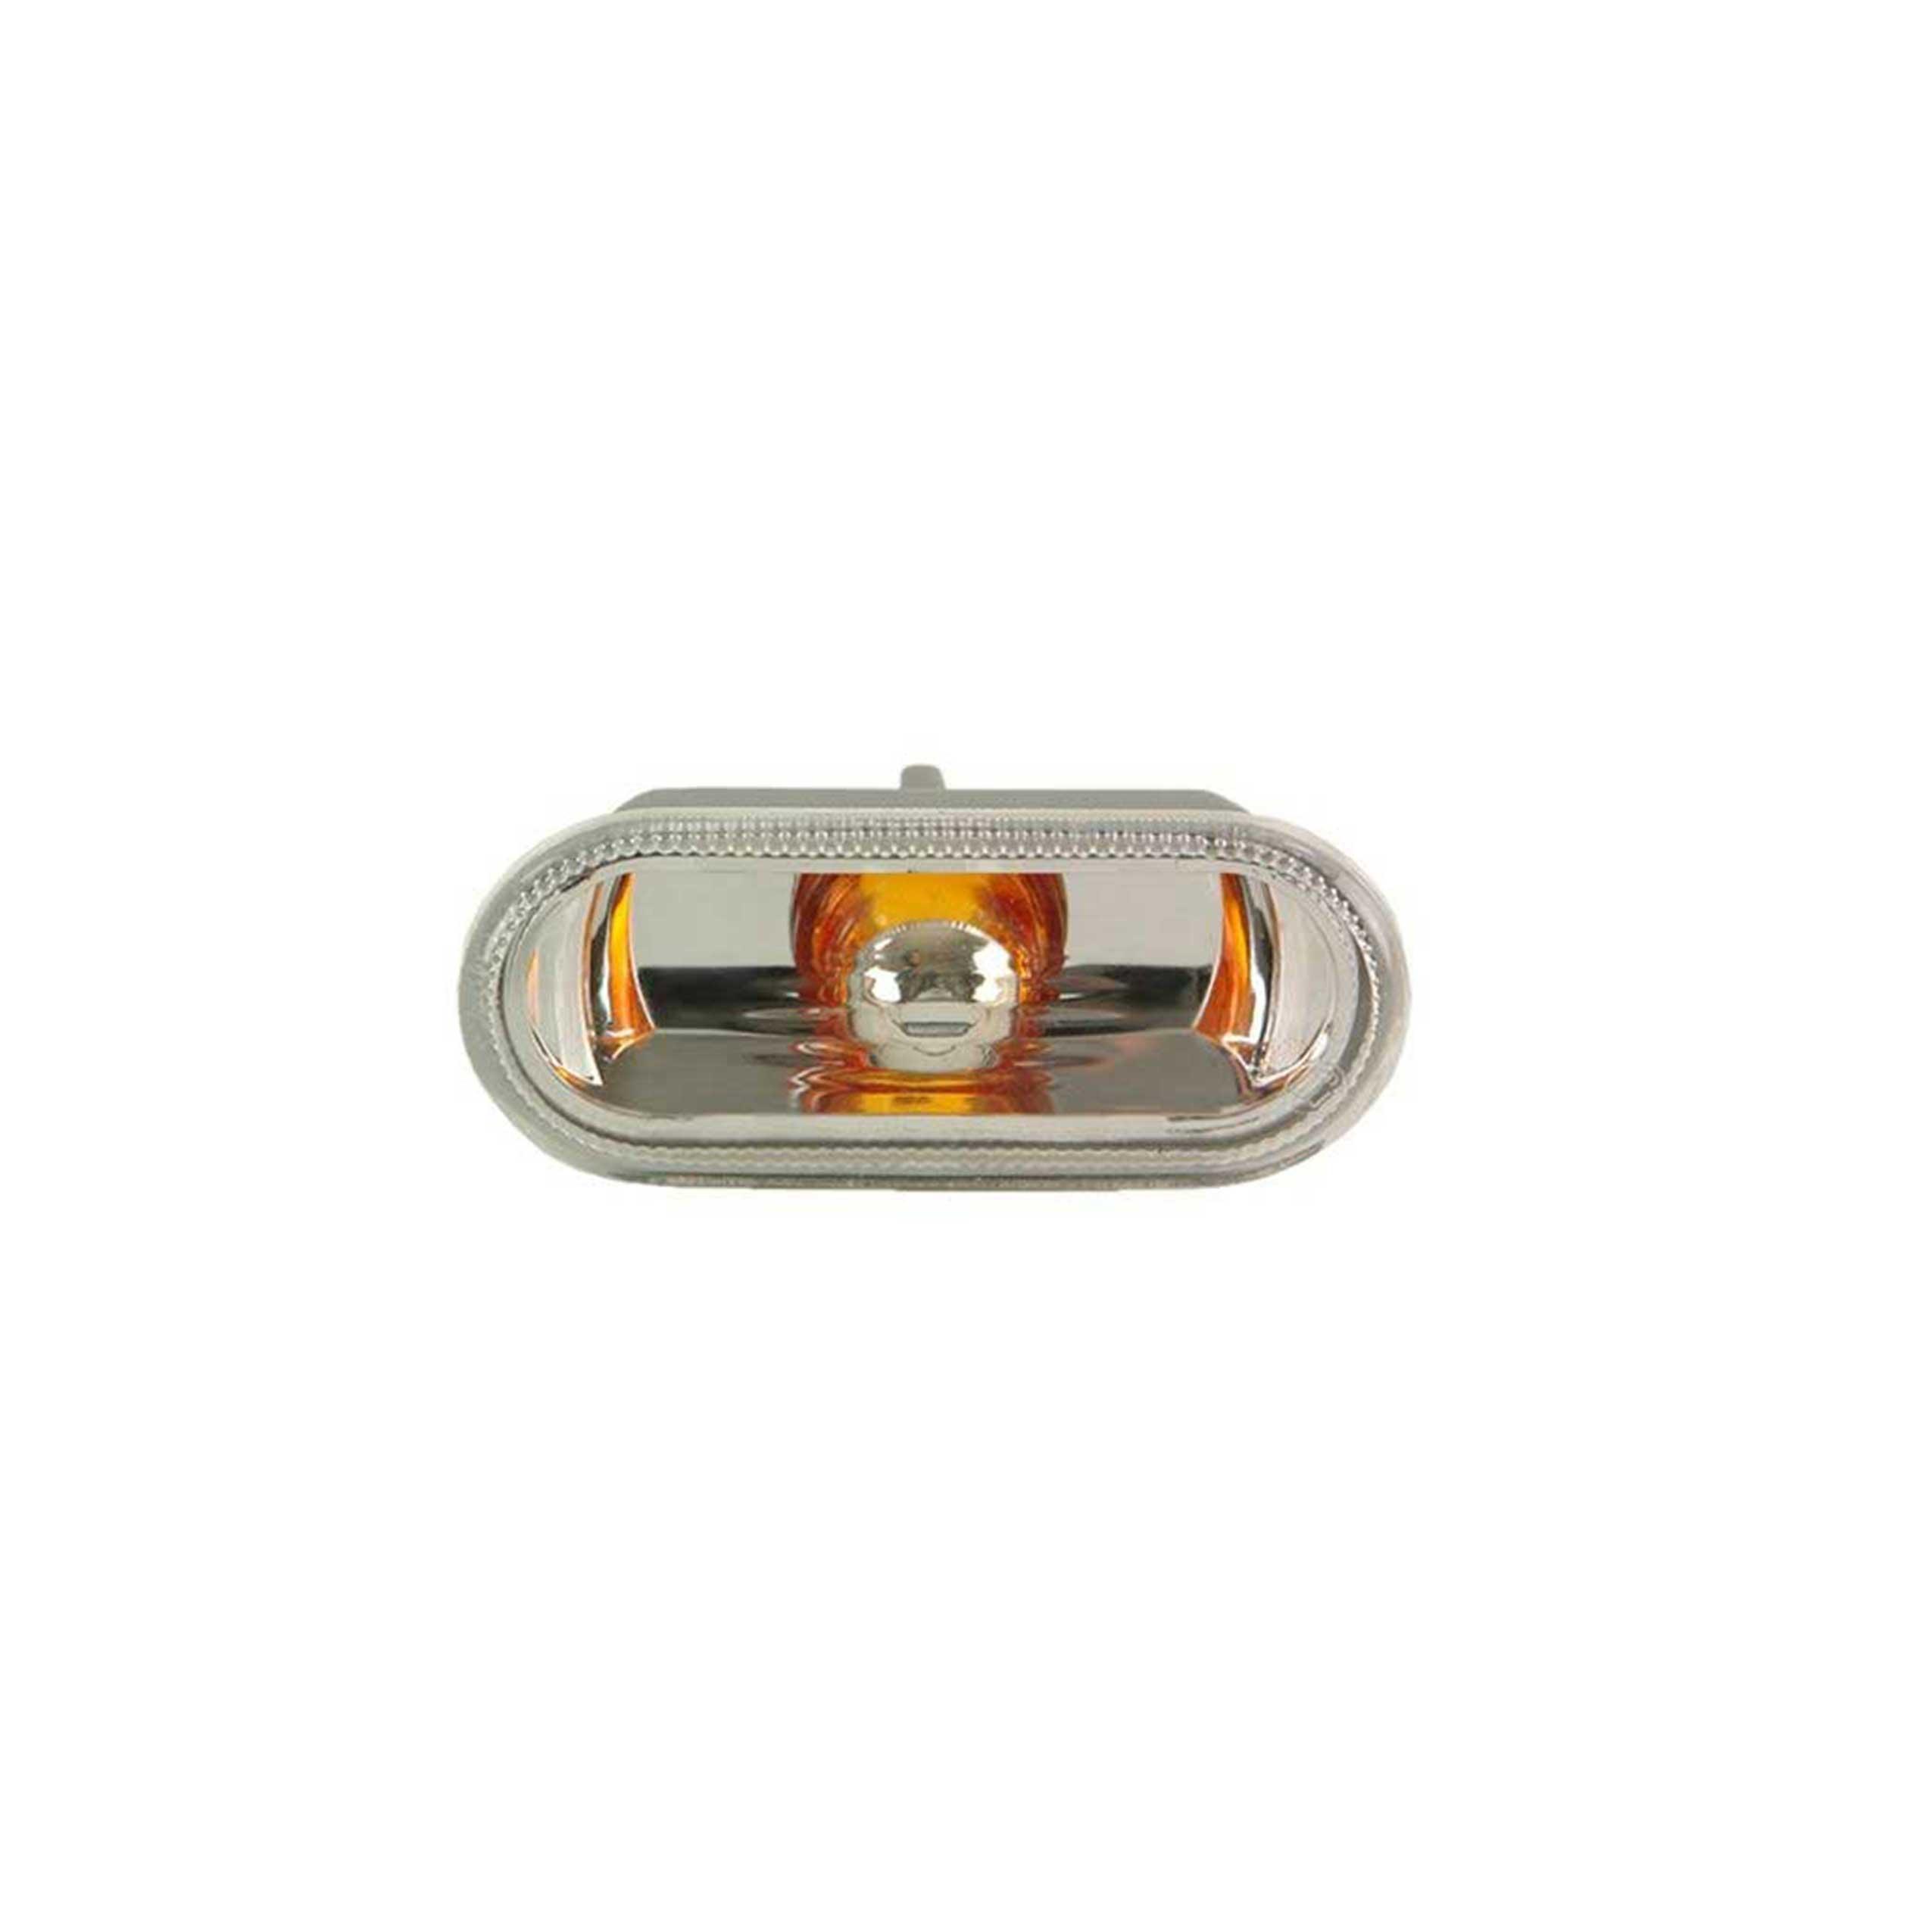 Çamurluk Sinyali - Caddy 3 - Jetta 4 - Lupo - Passat - Polo Hb - Sharan